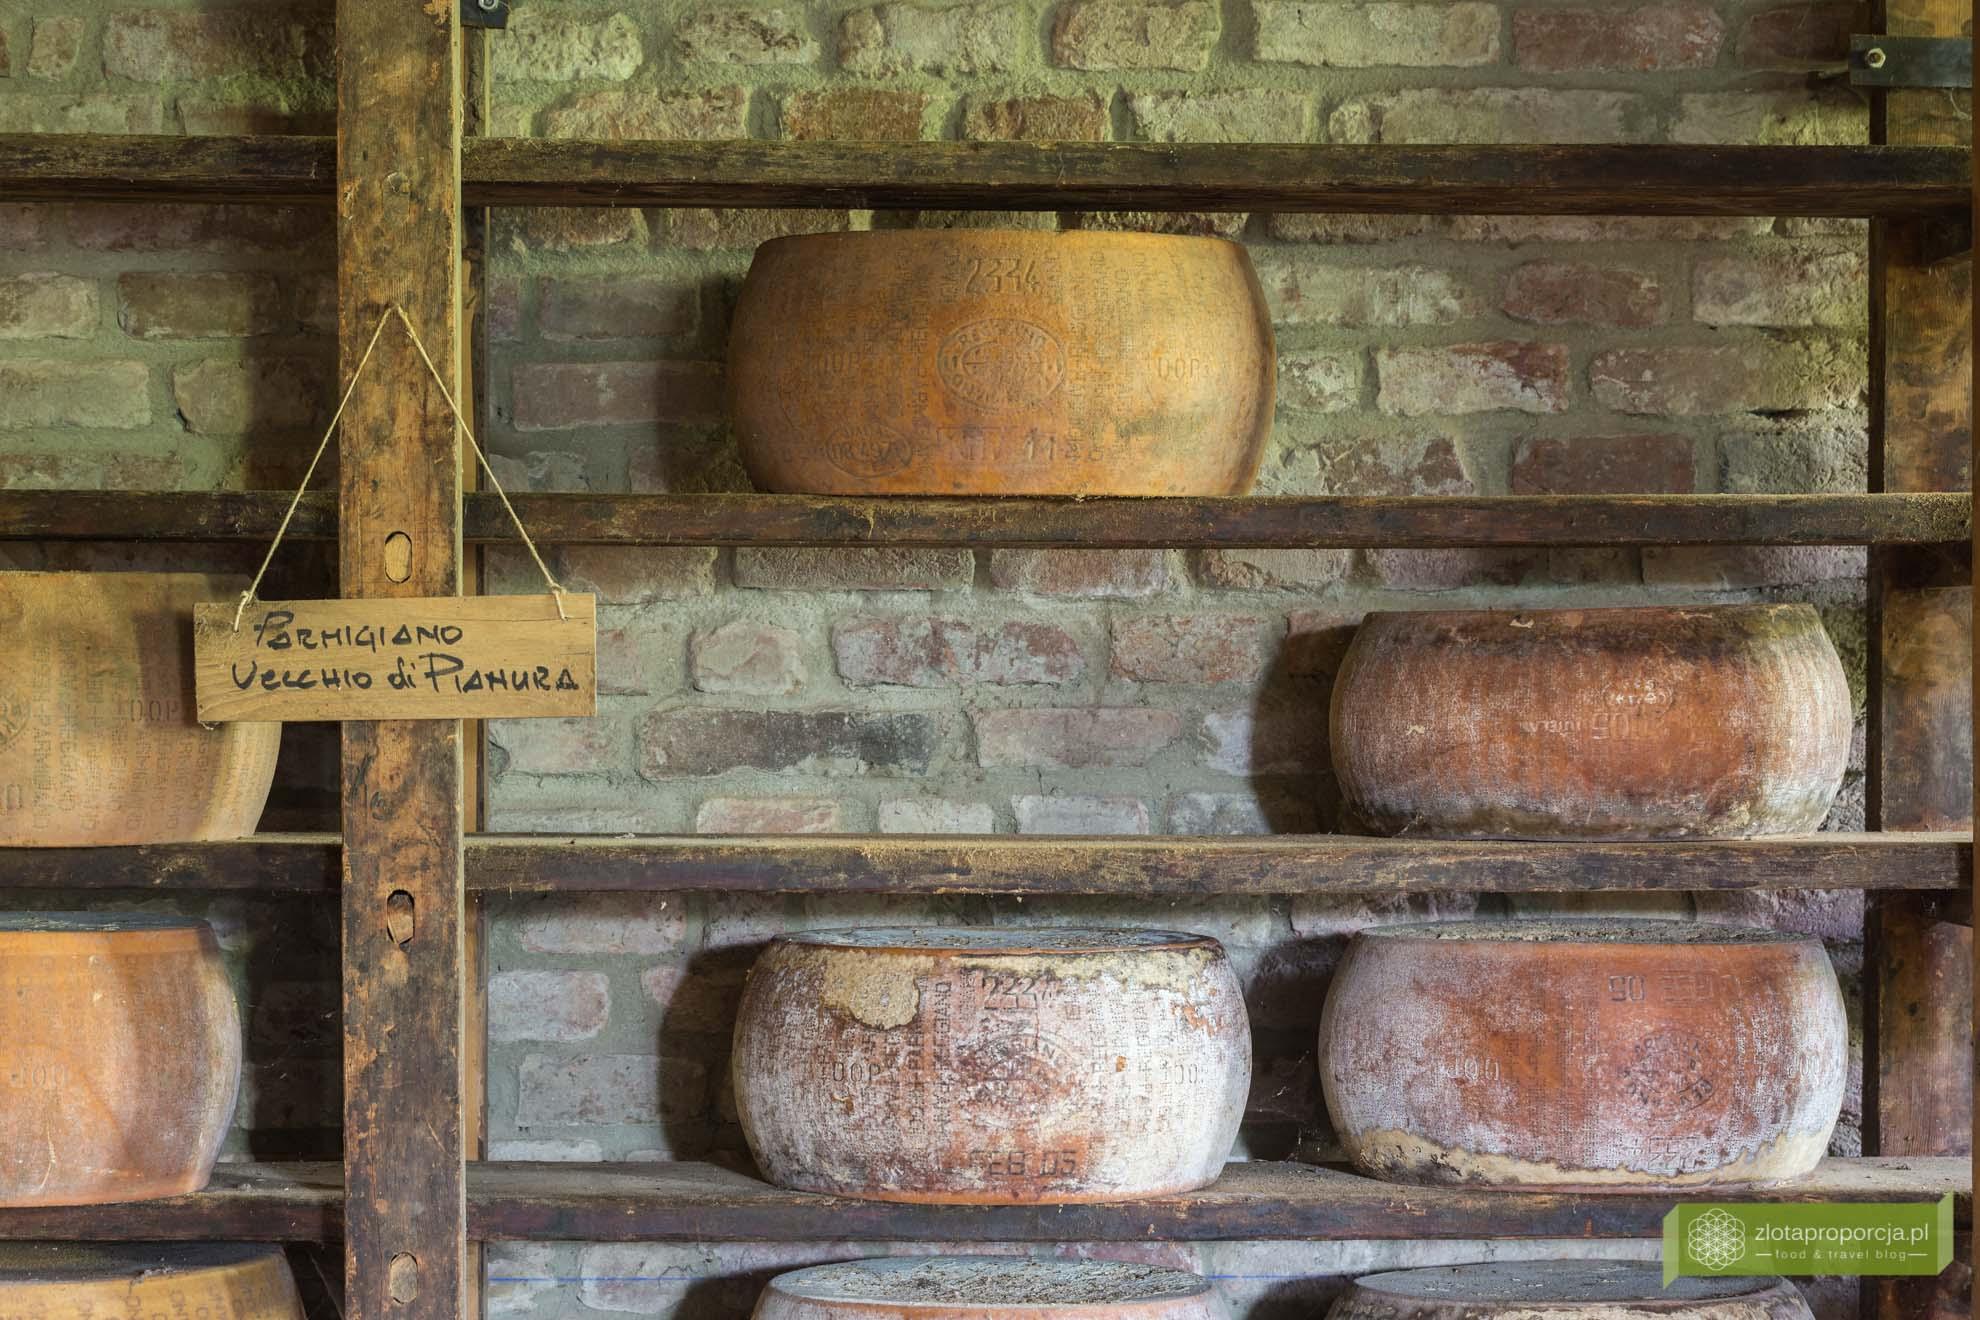 parmezan, Antica Corte Pallavicina, Emilia-Romania; kuchnia Emilii-Romanii; kuchnia włoska, okolice Parmy, spigaroli;